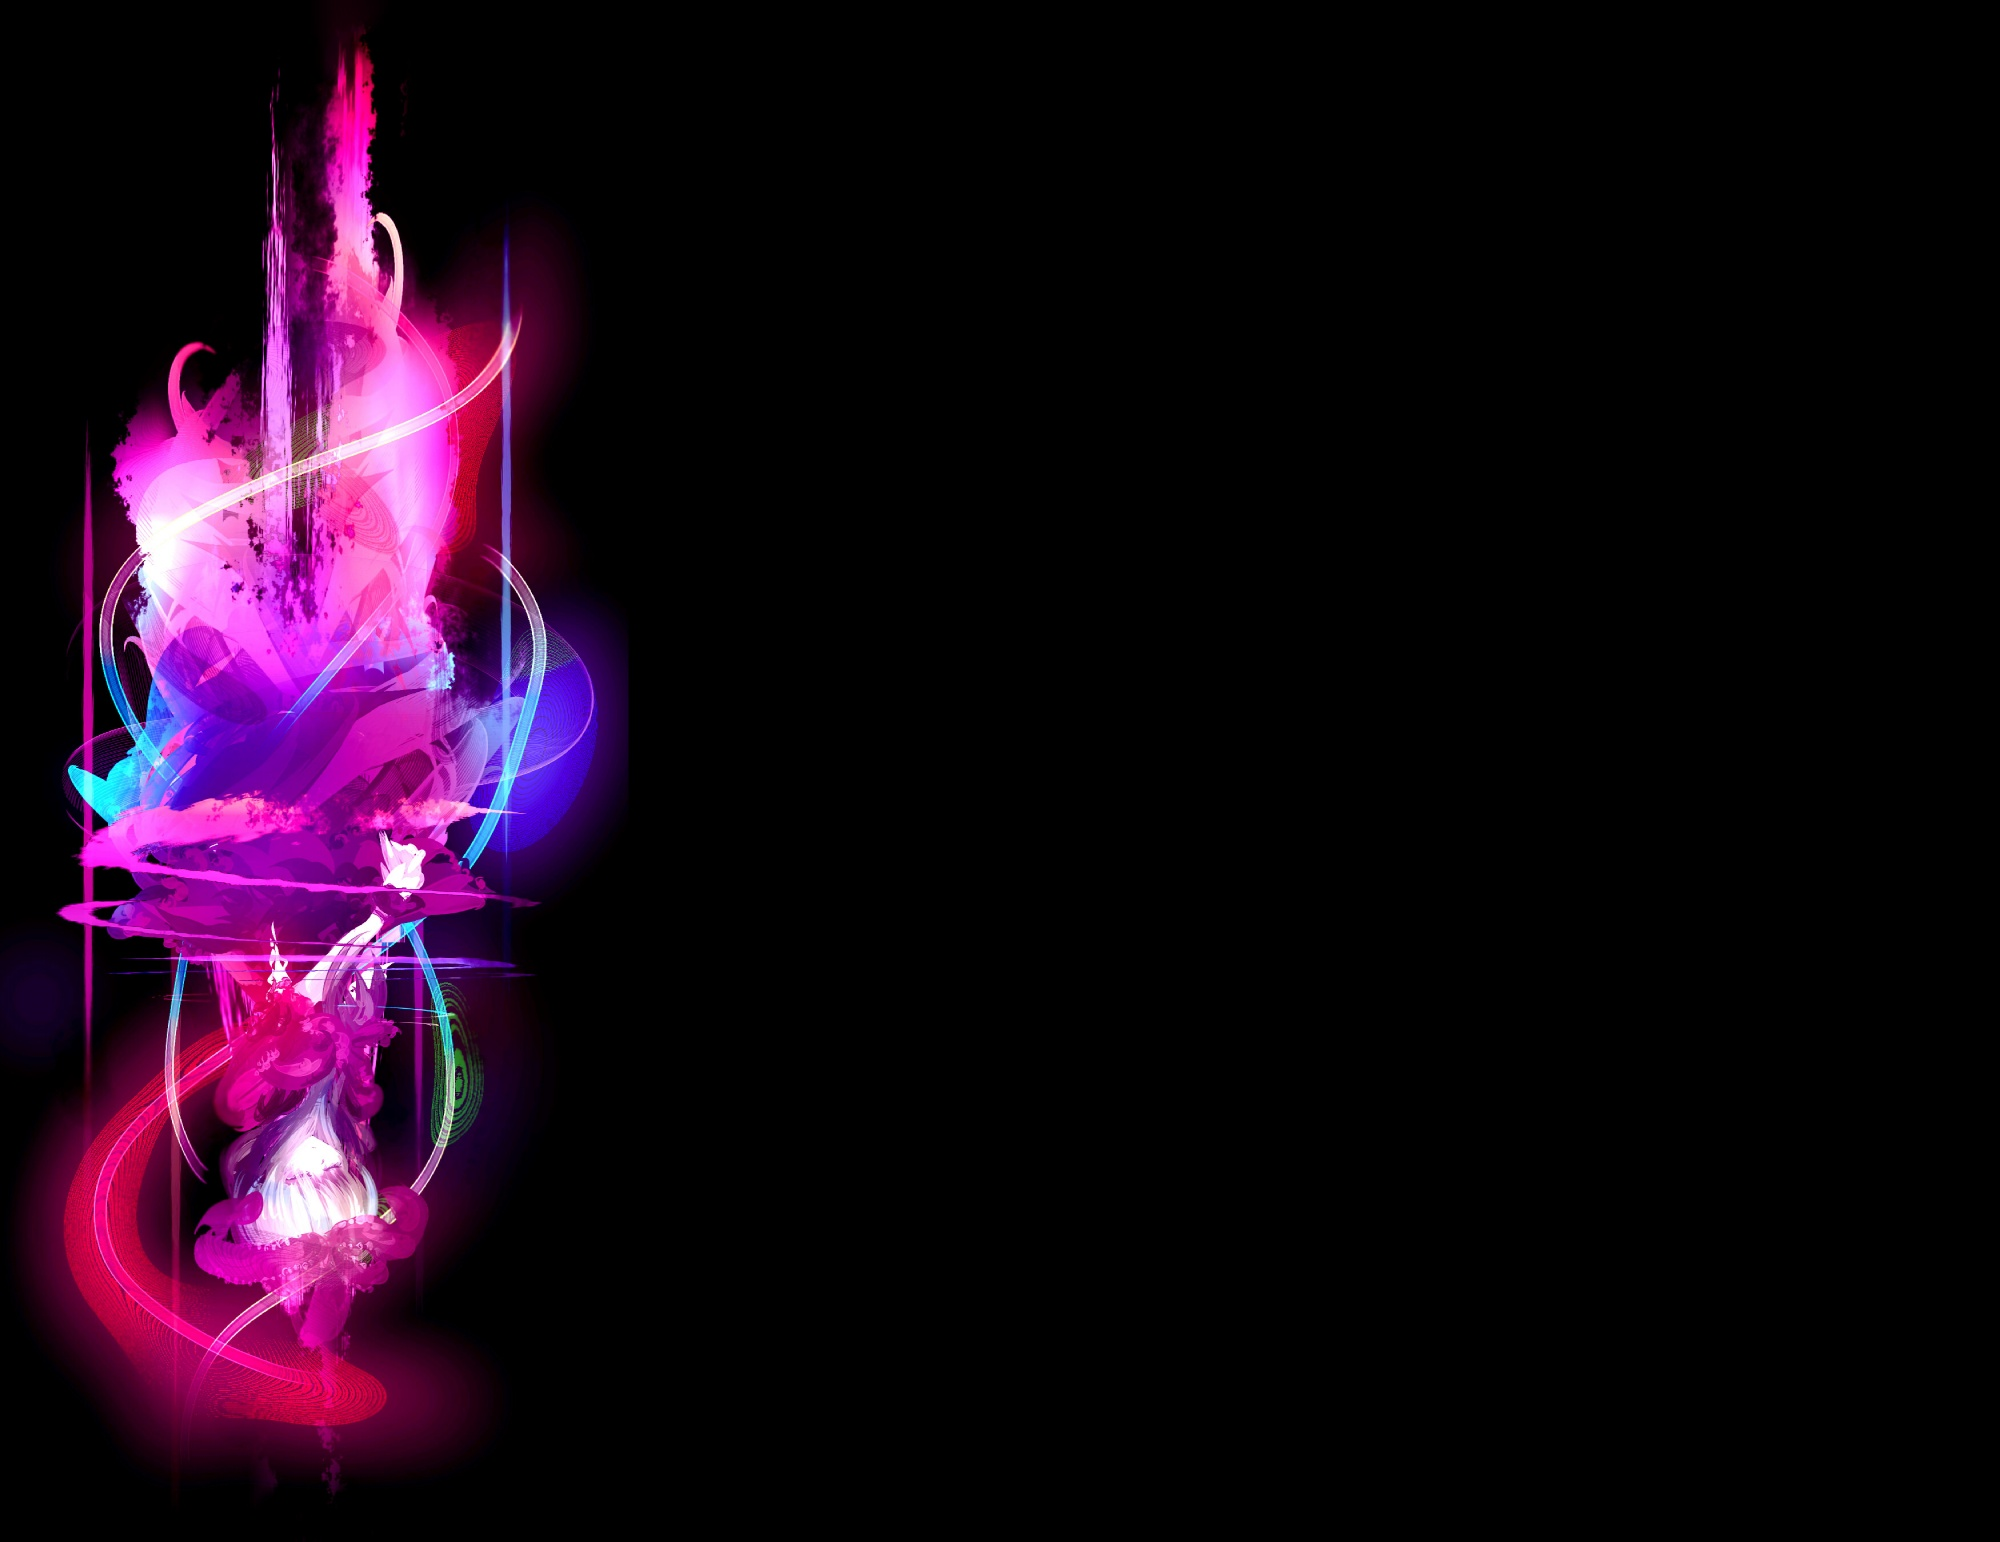 Neon Pink Background Wallpaper - WallpaperSafari